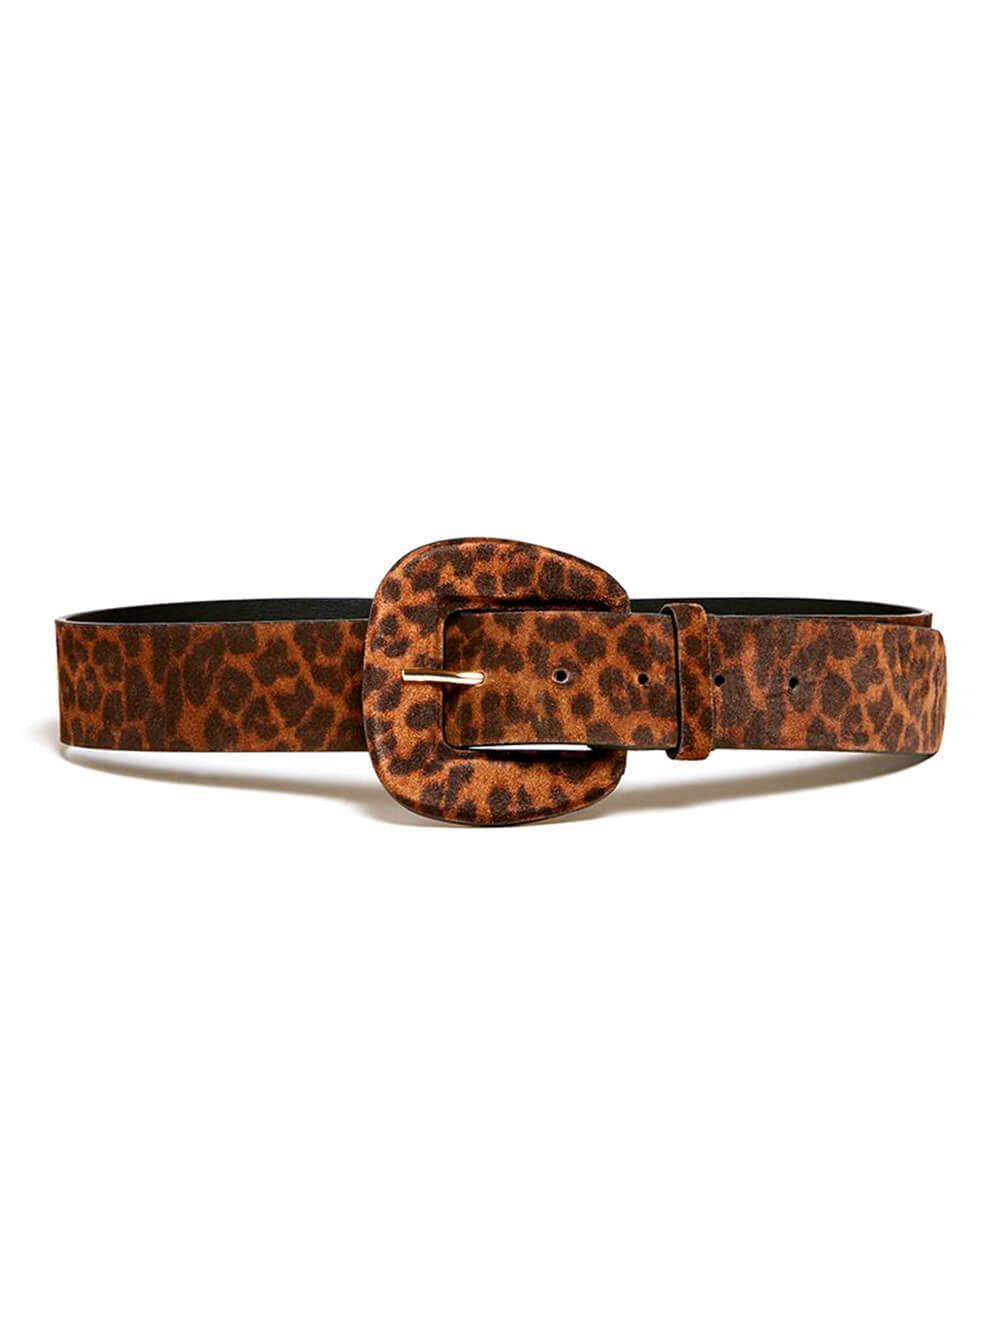 Emsy Belt Item # B200801LS